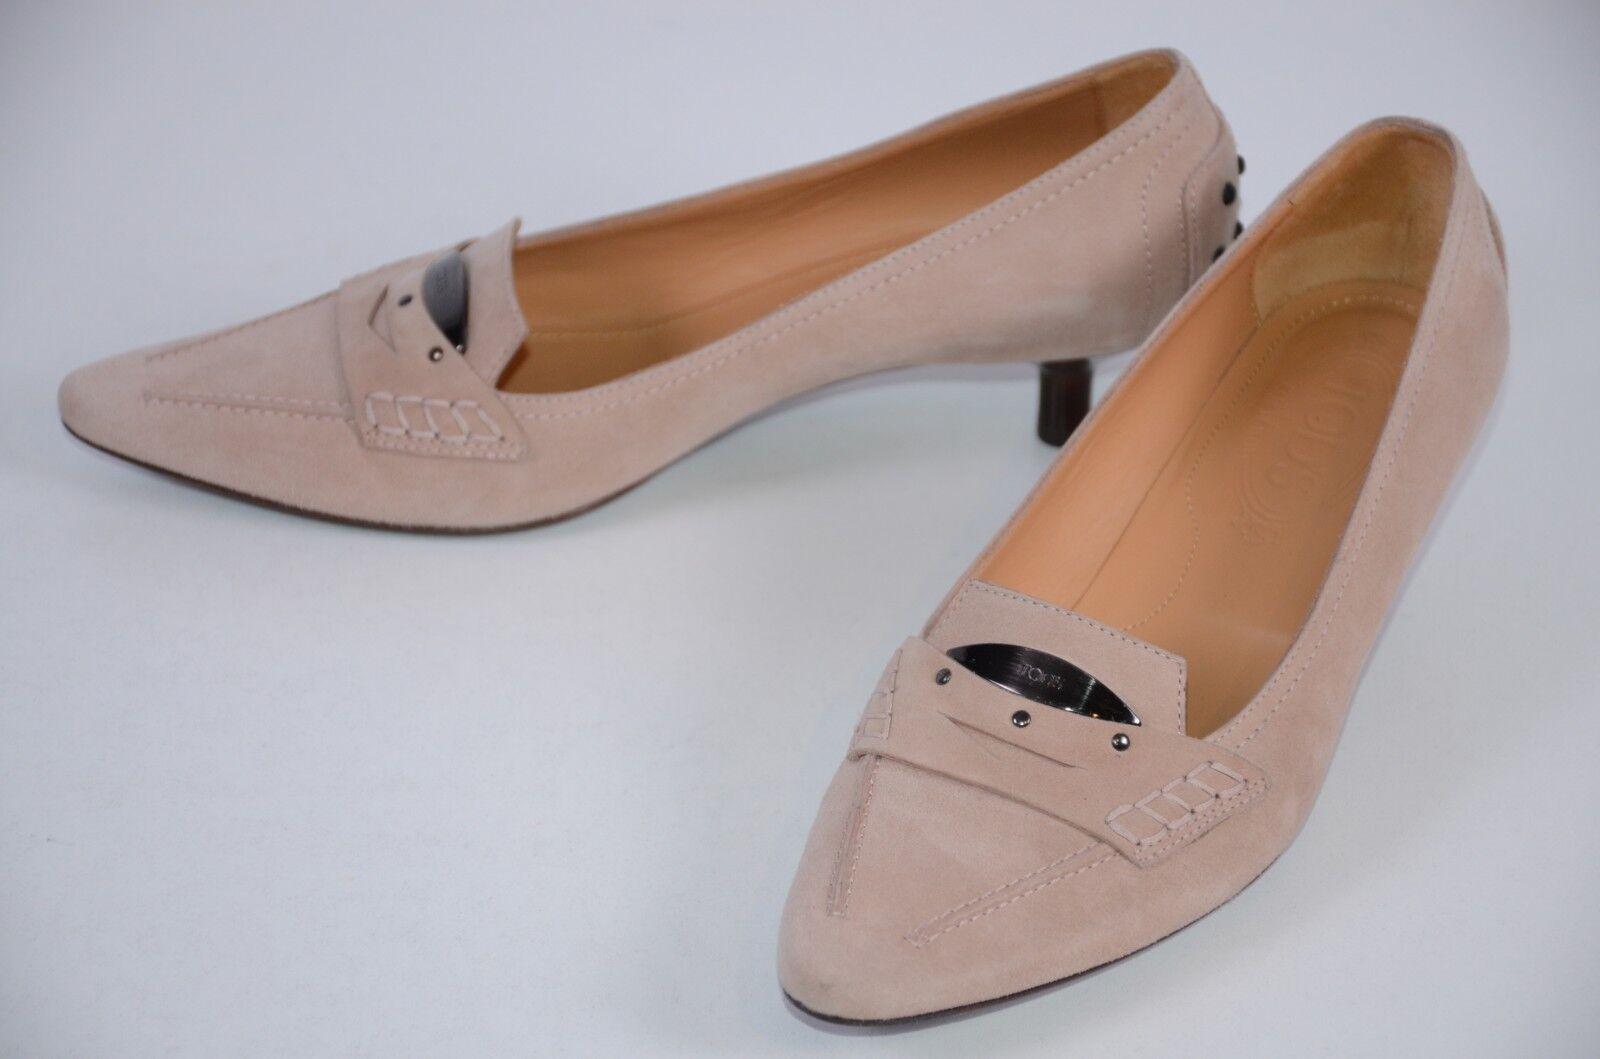 distribuzione globale Tod's Donna  scarpe Dimensione 8.5  Slip On Blush Blush Blush rosa Suede Kitten Heel Career  acquista online oggi